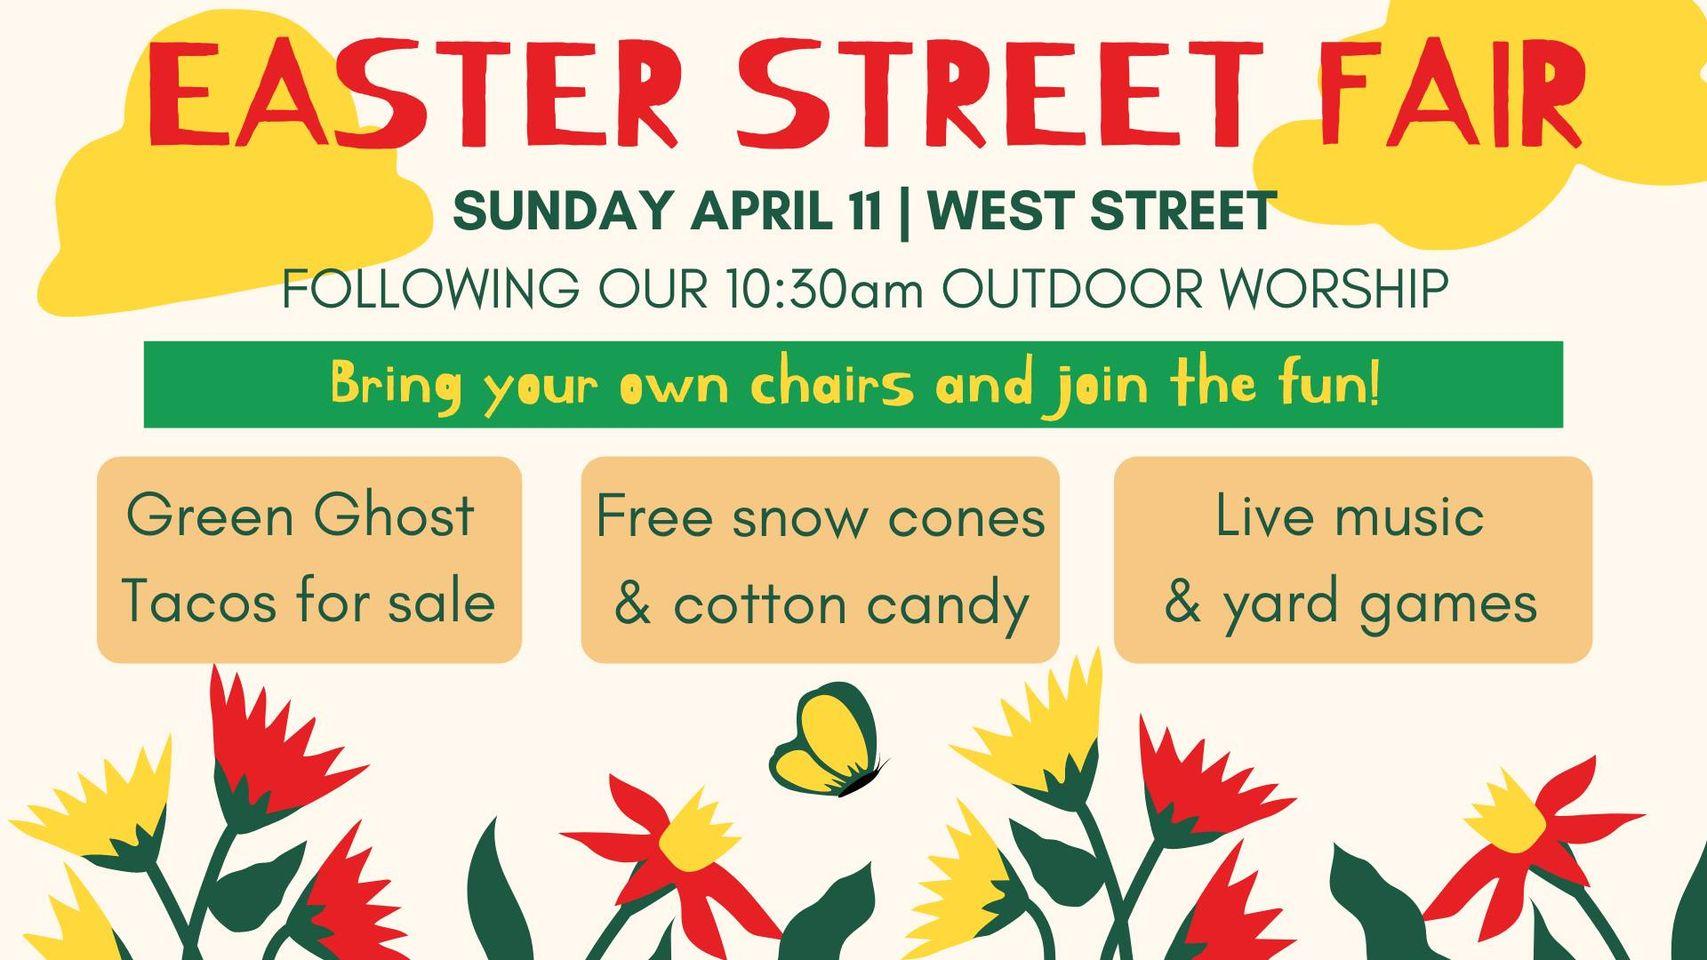 Easter Street Fair